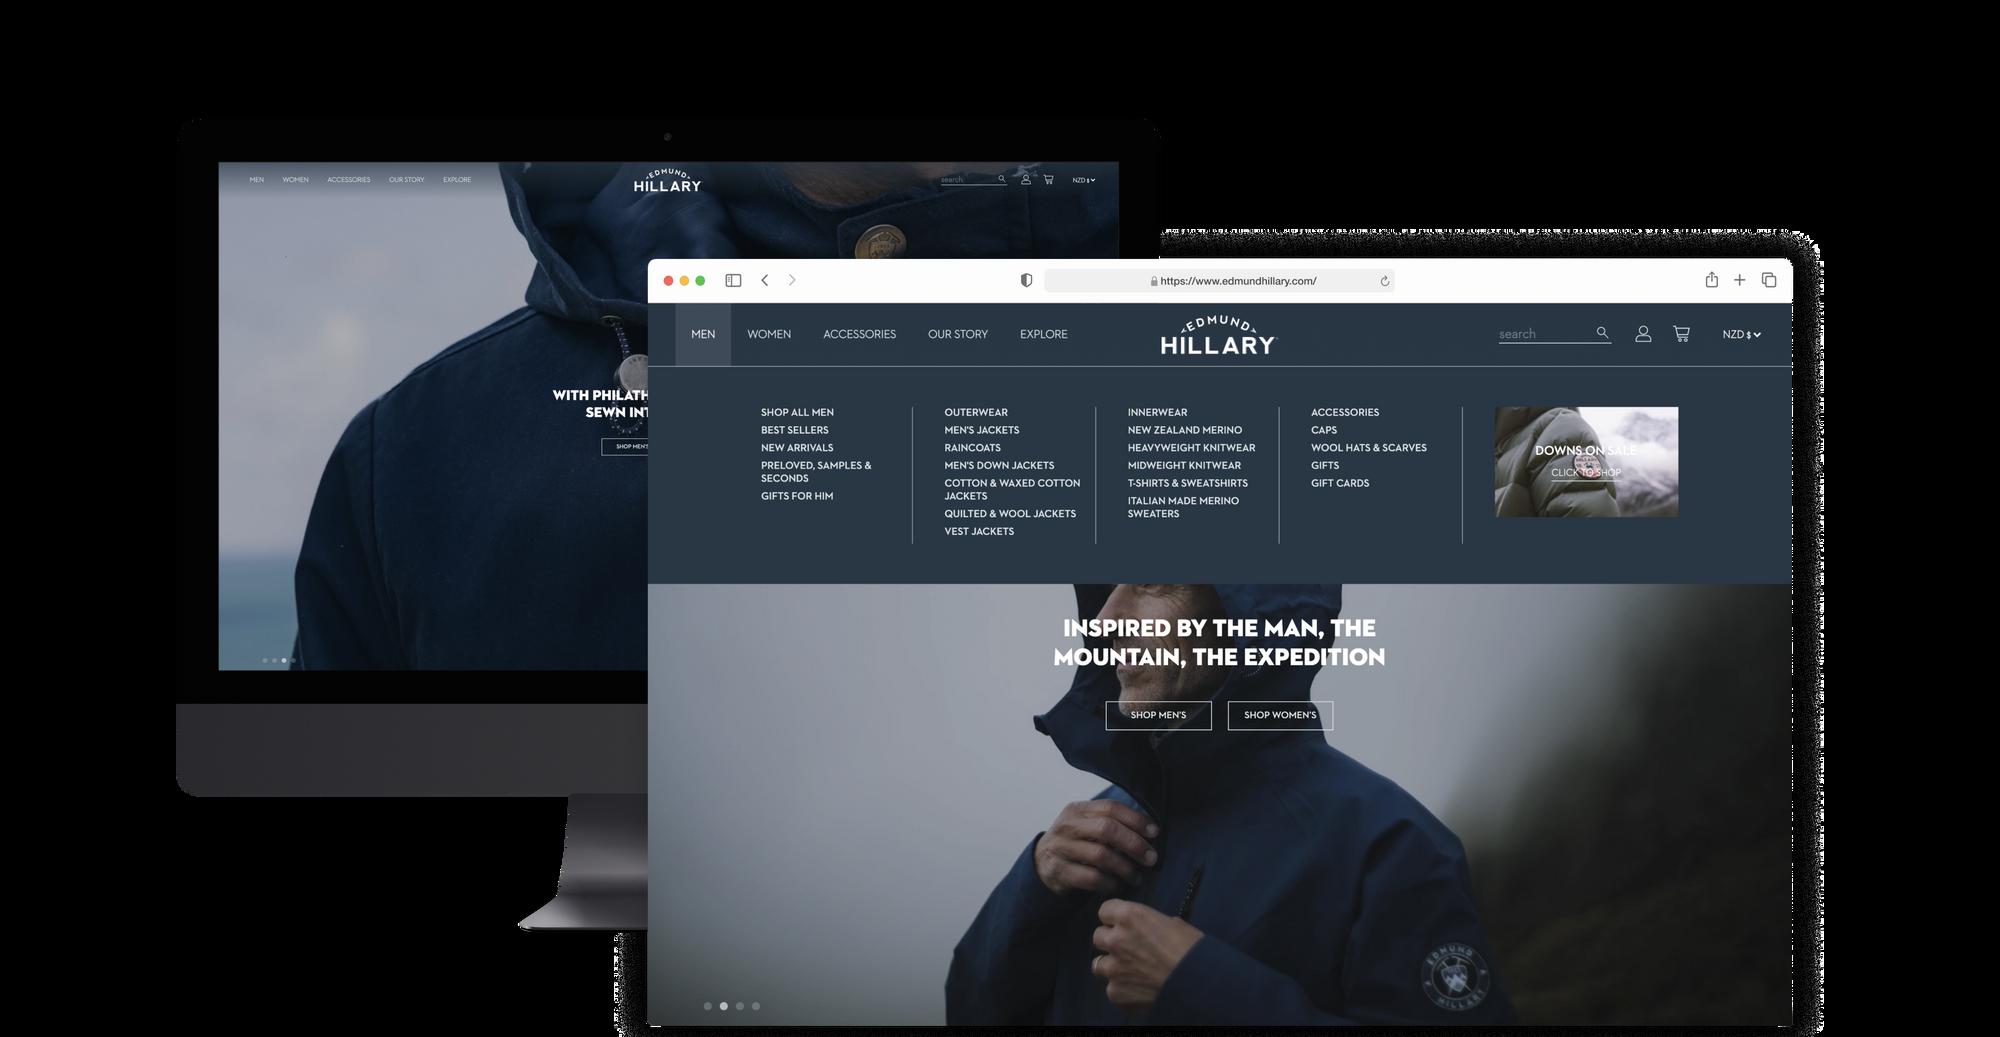 Edmund Hillary - digital marketing